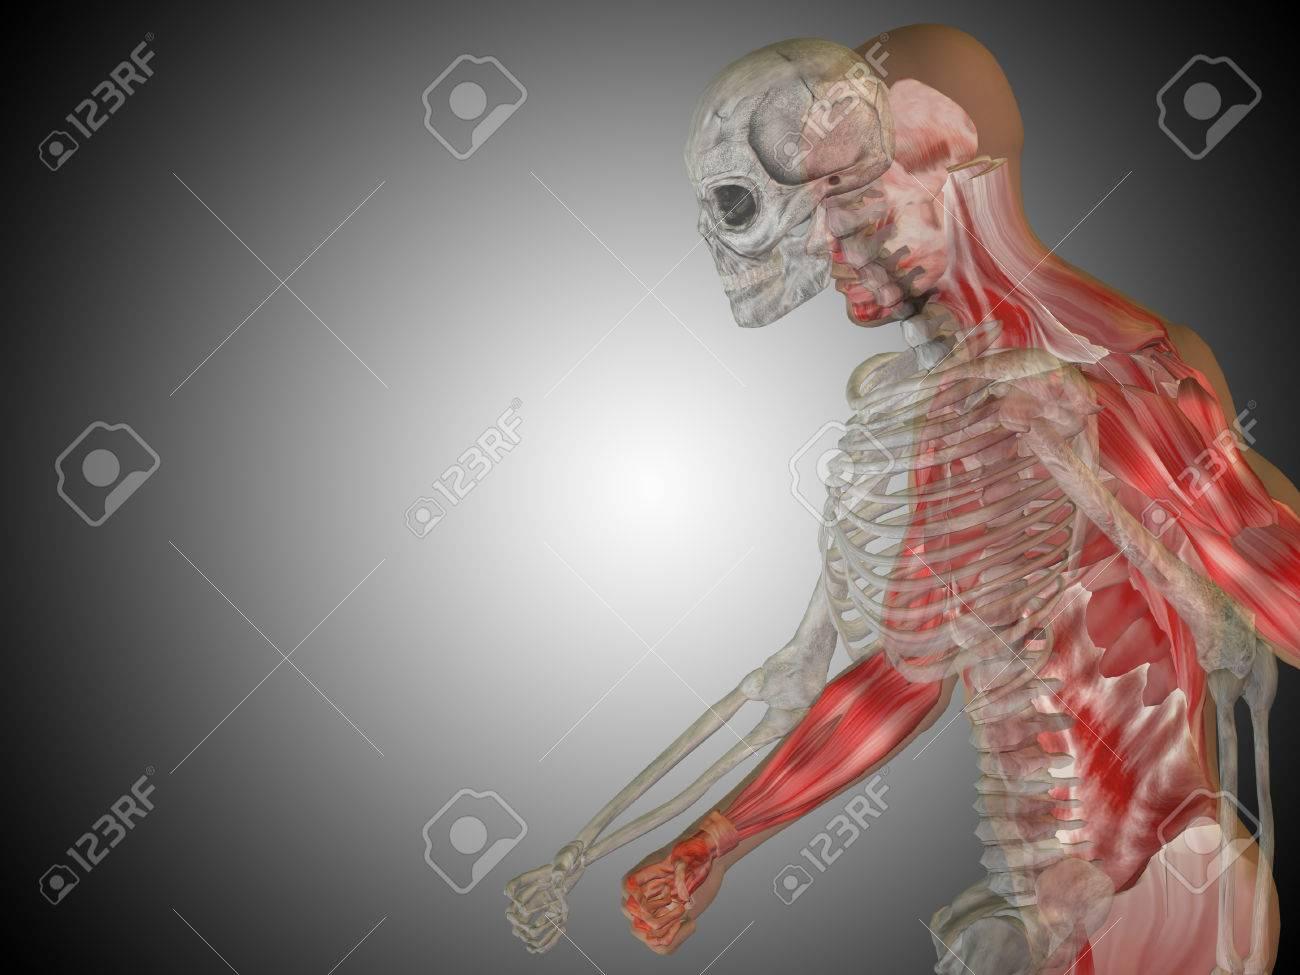 The unfashionable human body 45